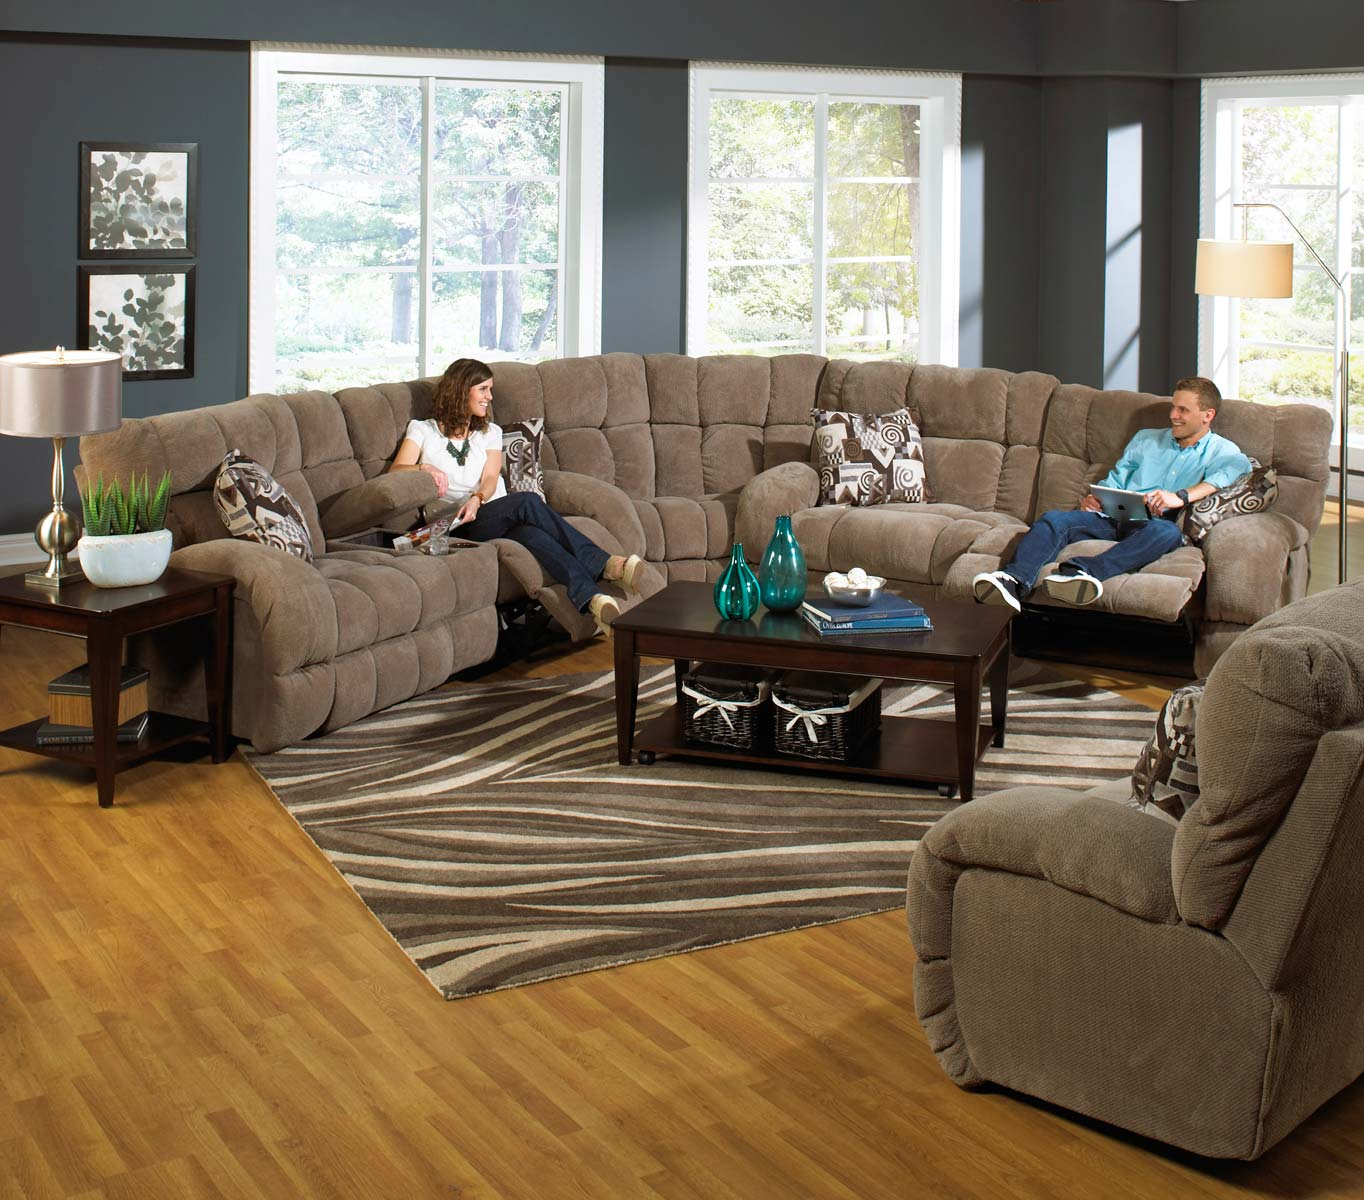 Catnapper Siesta Lay Flat Reclining Sectional Sofa Set A Porcini Cn 1761 Siesta Sect Set 1